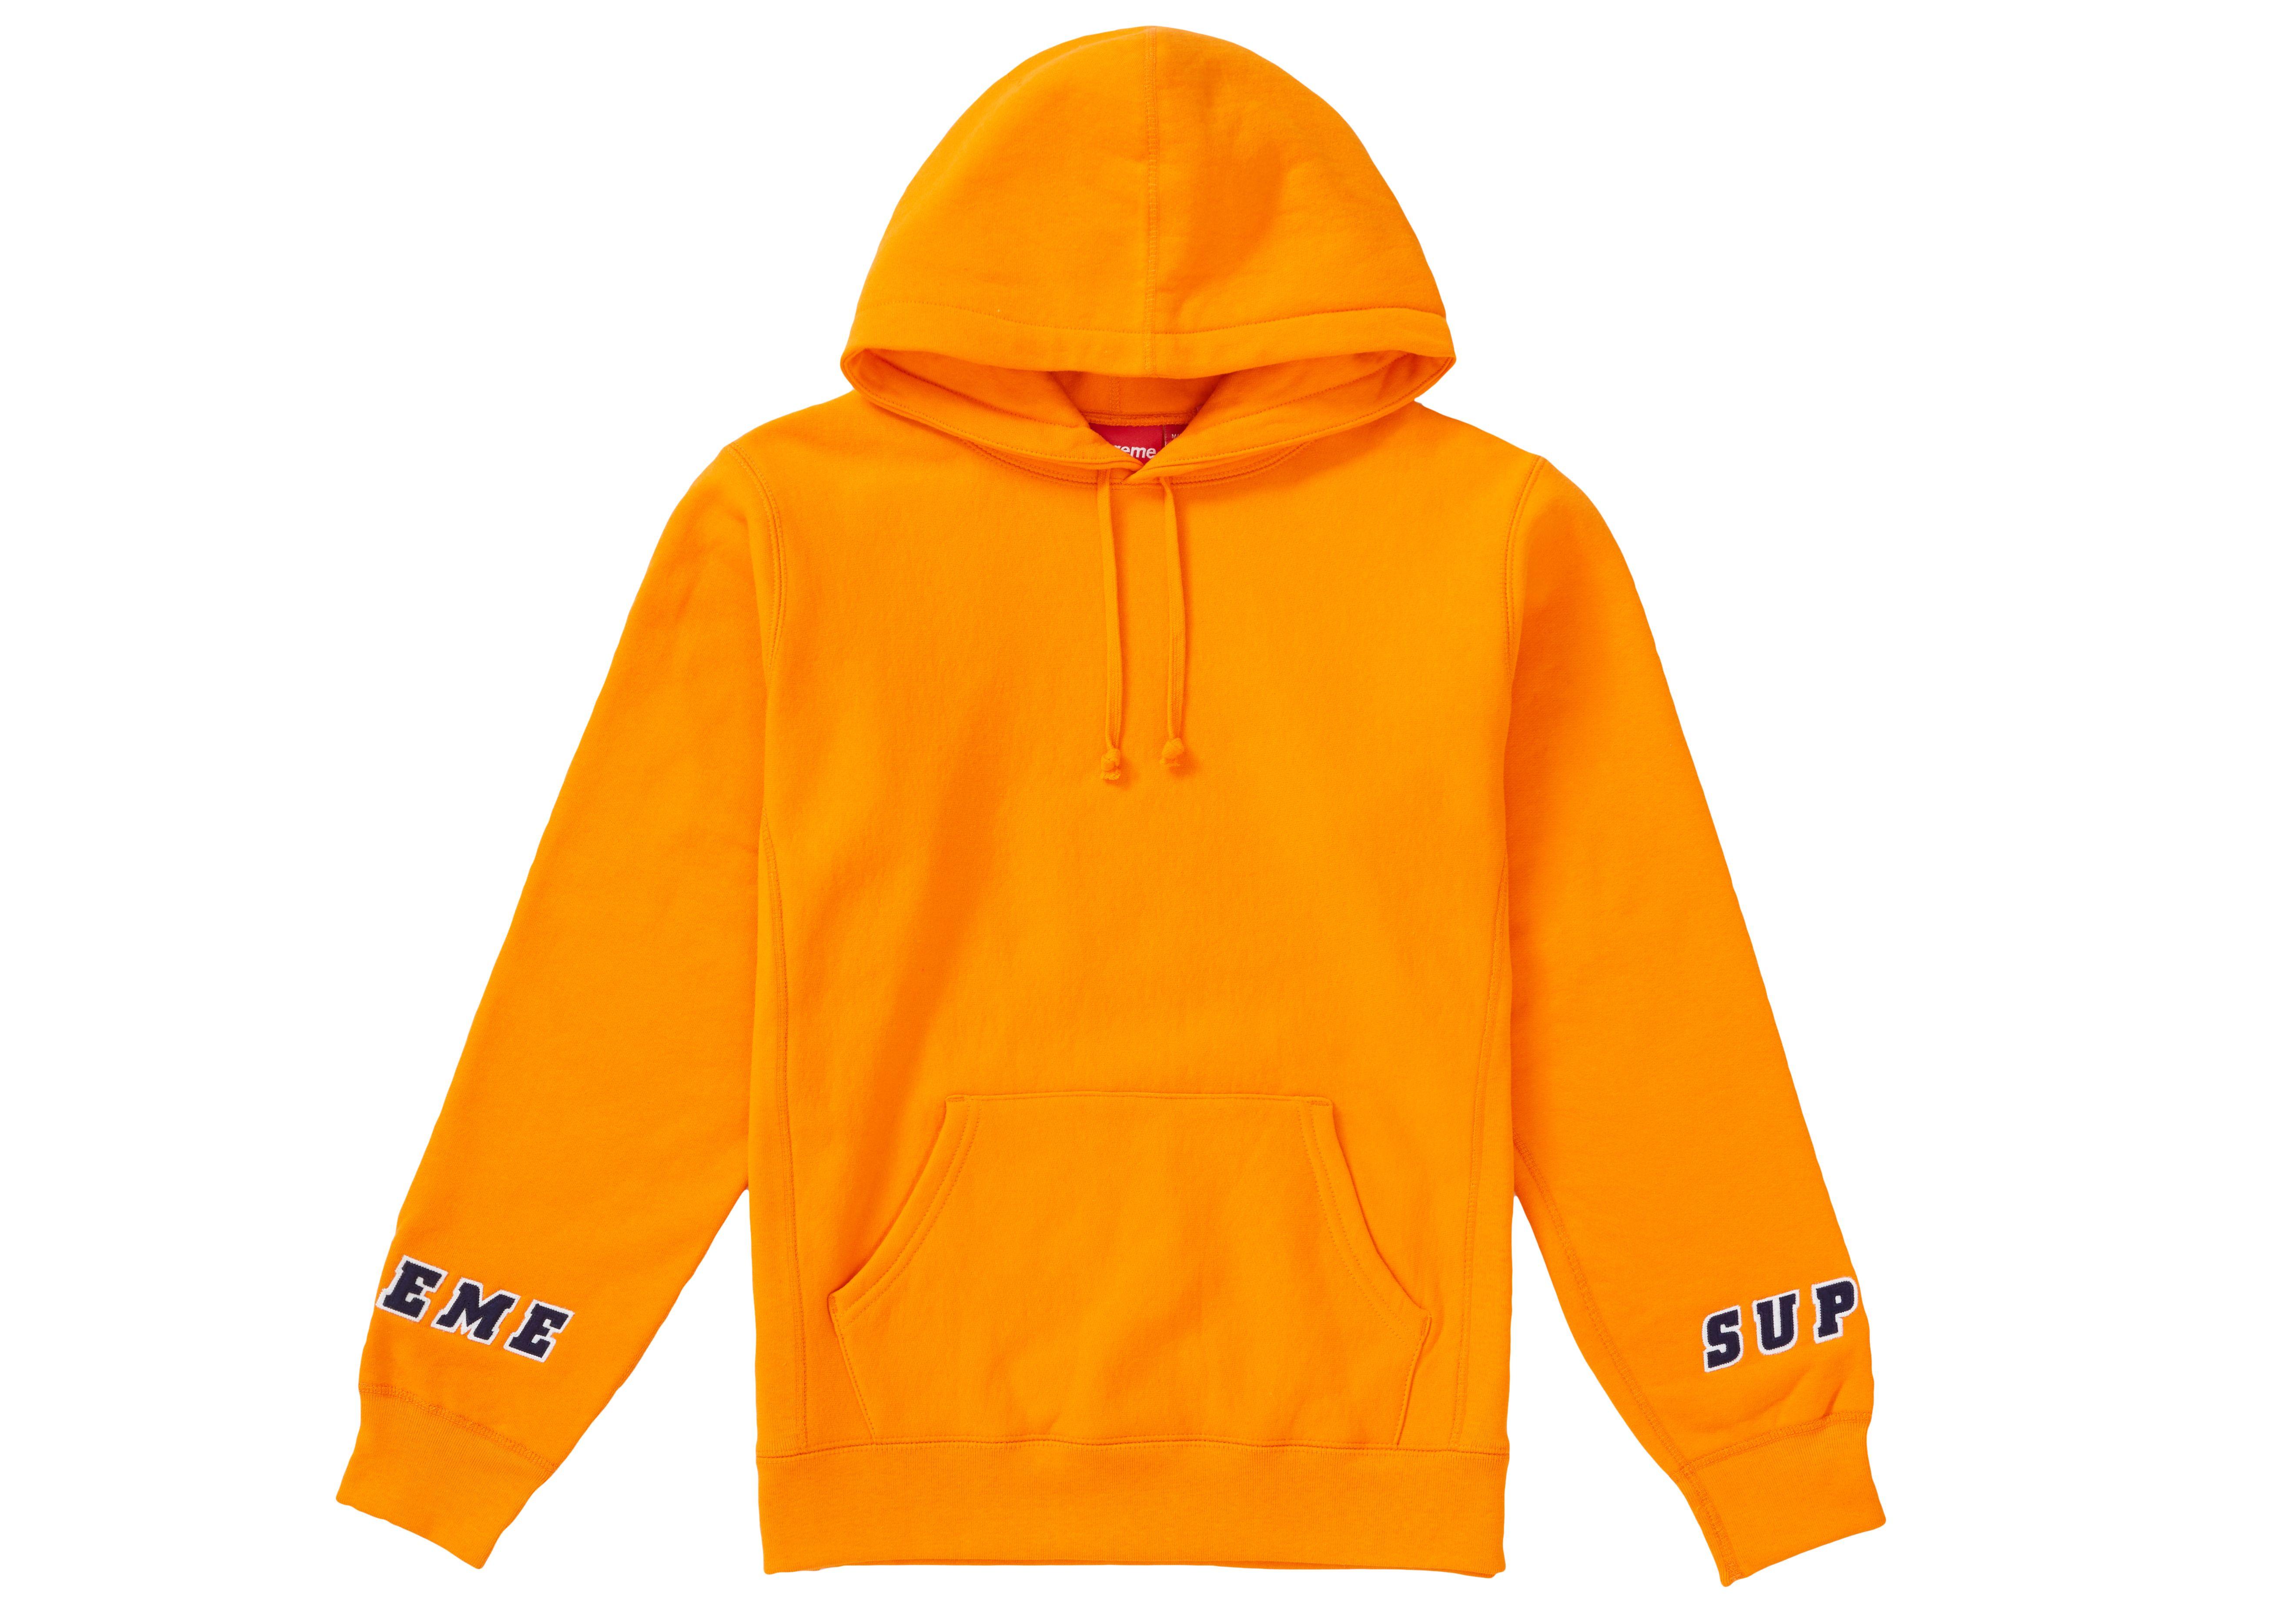 Supreme Wrist Logo Hooded Sweatshirt Orange Supreme Cloth Hooded Sweatshirts Sweatshirts T Shirts S [ 3734 x 5228 Pixel ]